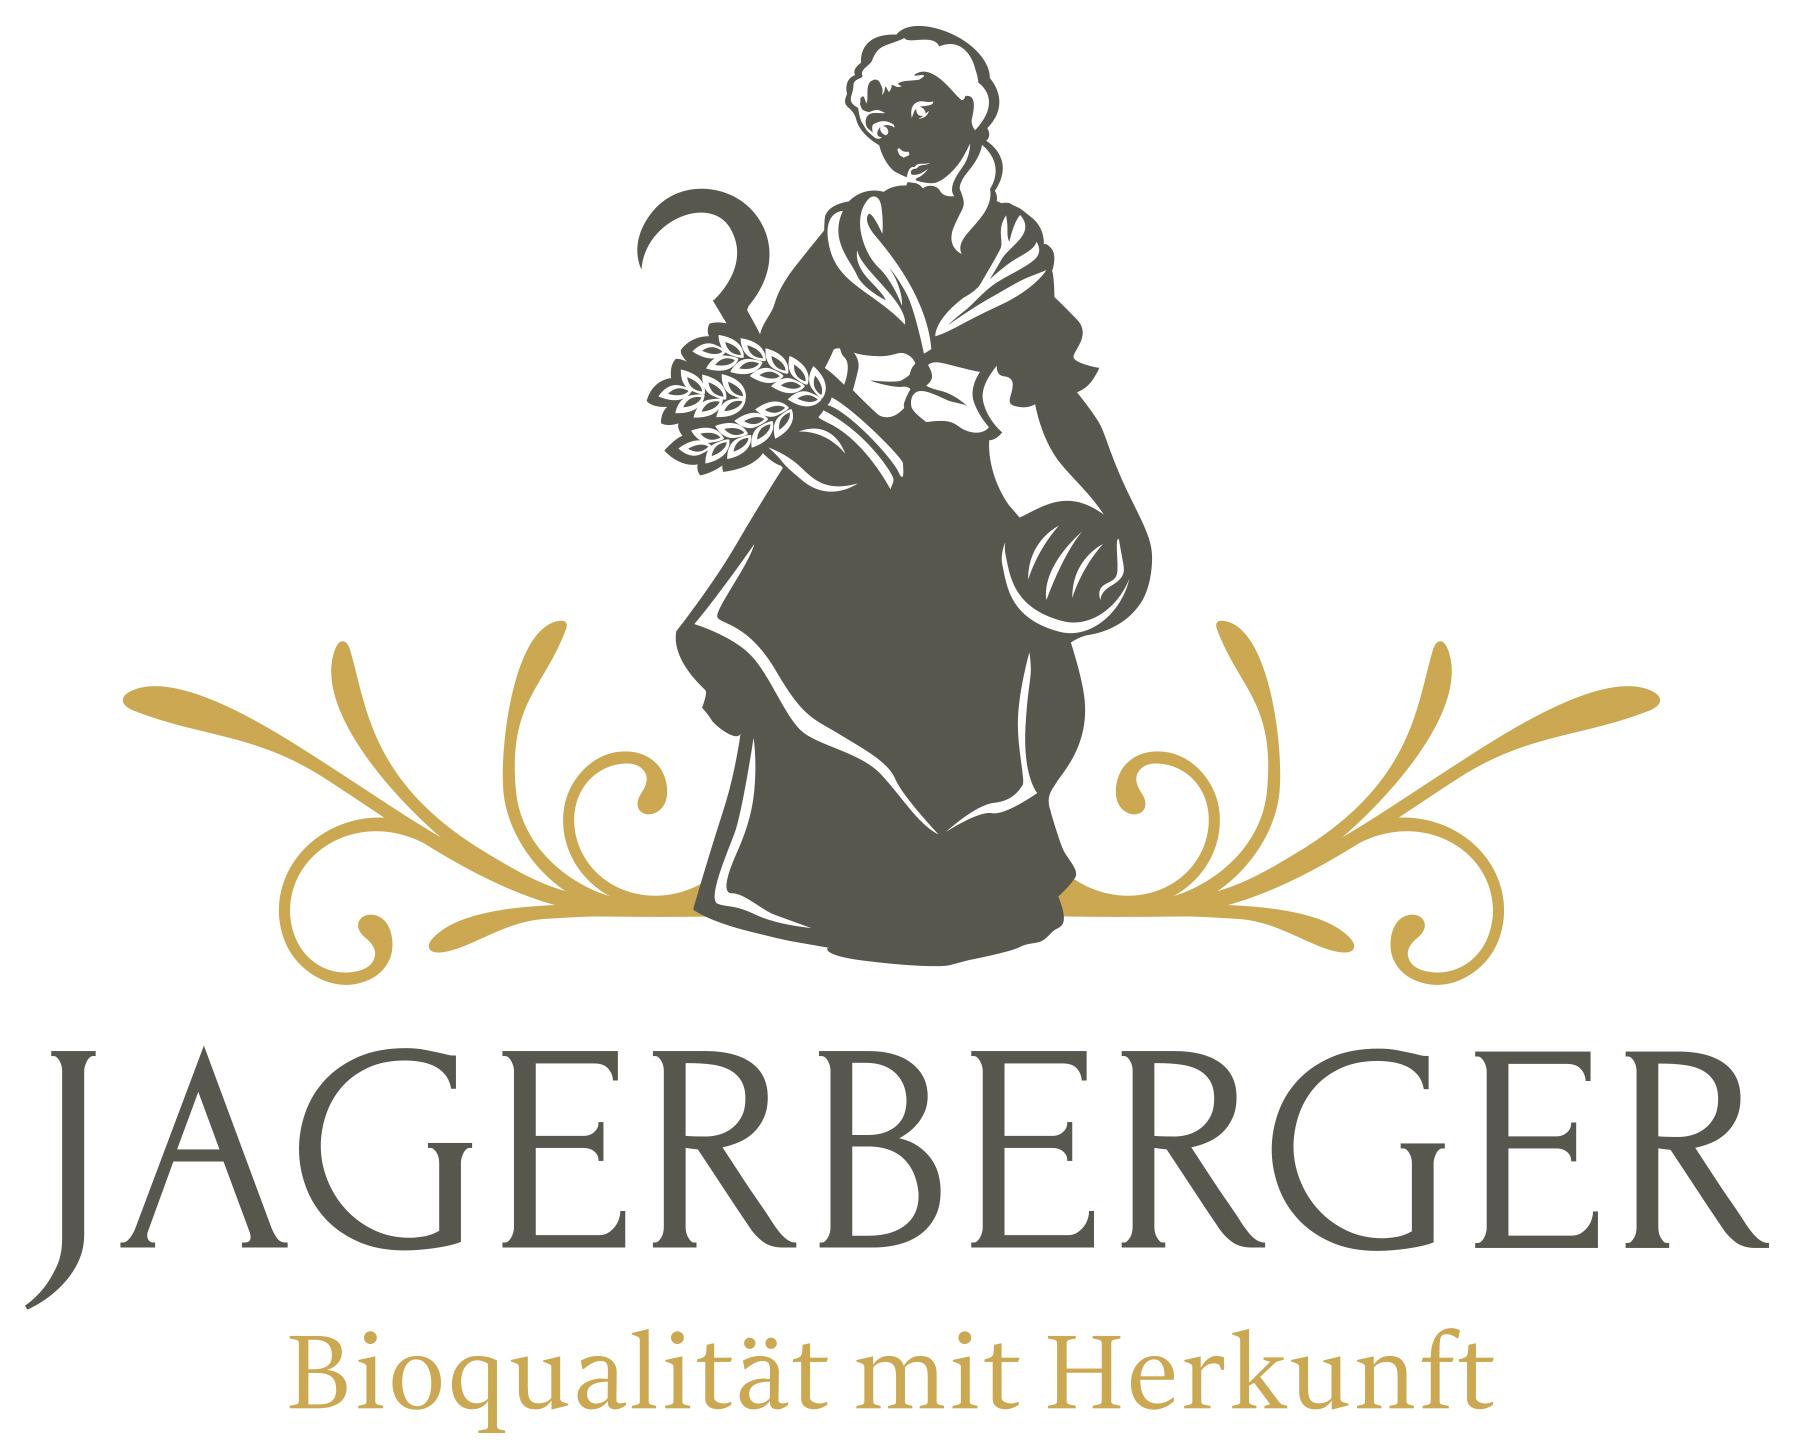 Marke-Jagerberger-Bio-DRUCK